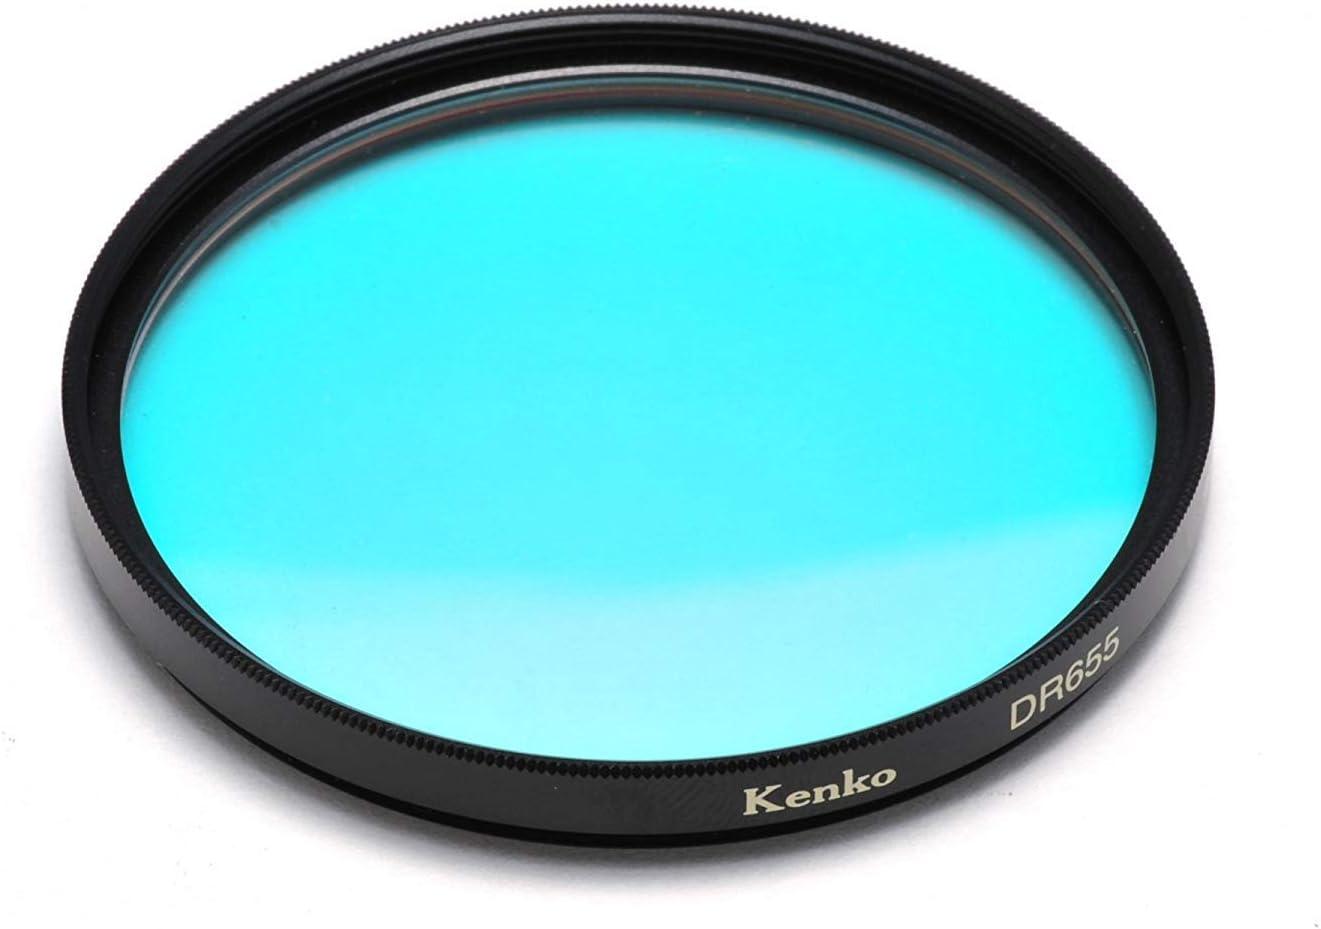 Kenko 77mm W12 Professional Multi-Coated Camera Lens Filters